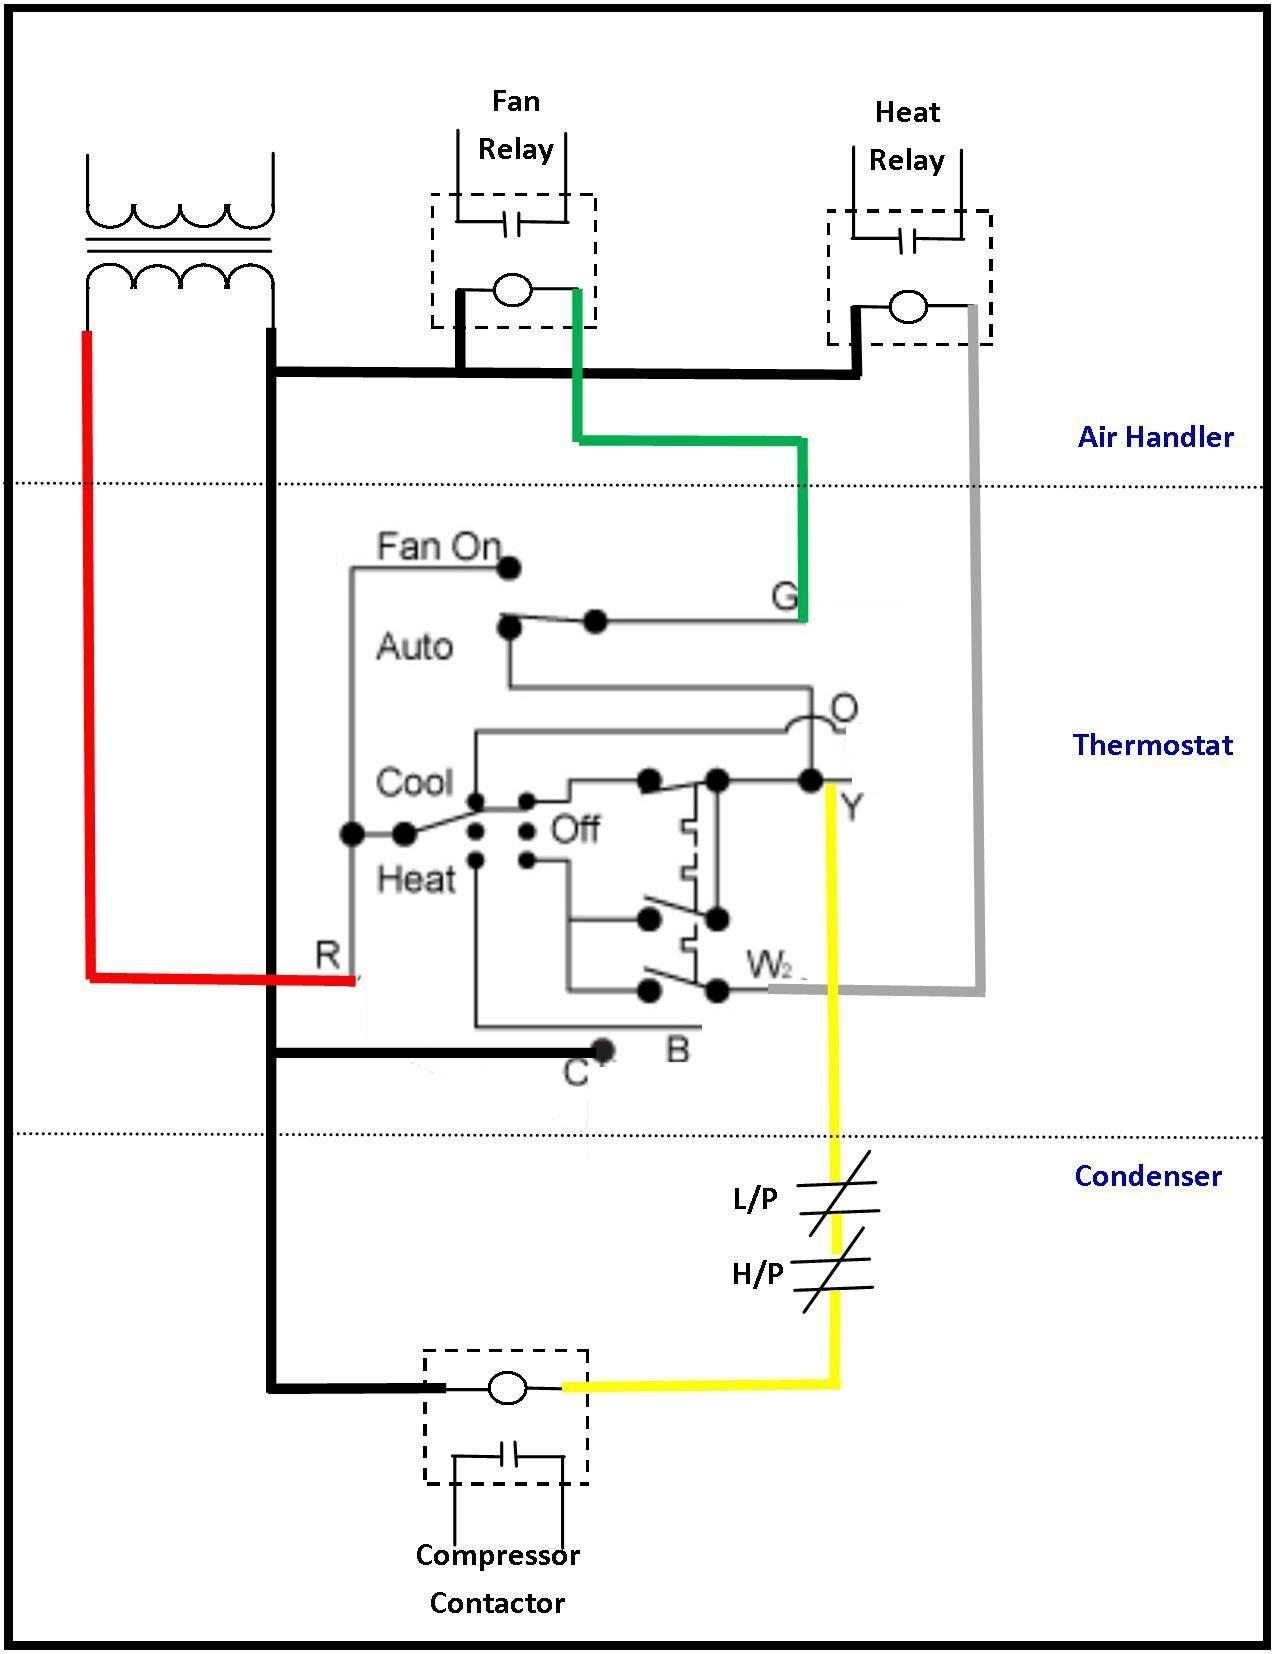 44 Luxury 24v Relay Wiring Diagram In 2020 Electrical Circuit Diagram Thermostat Wiring Electrical Wiring Diagram